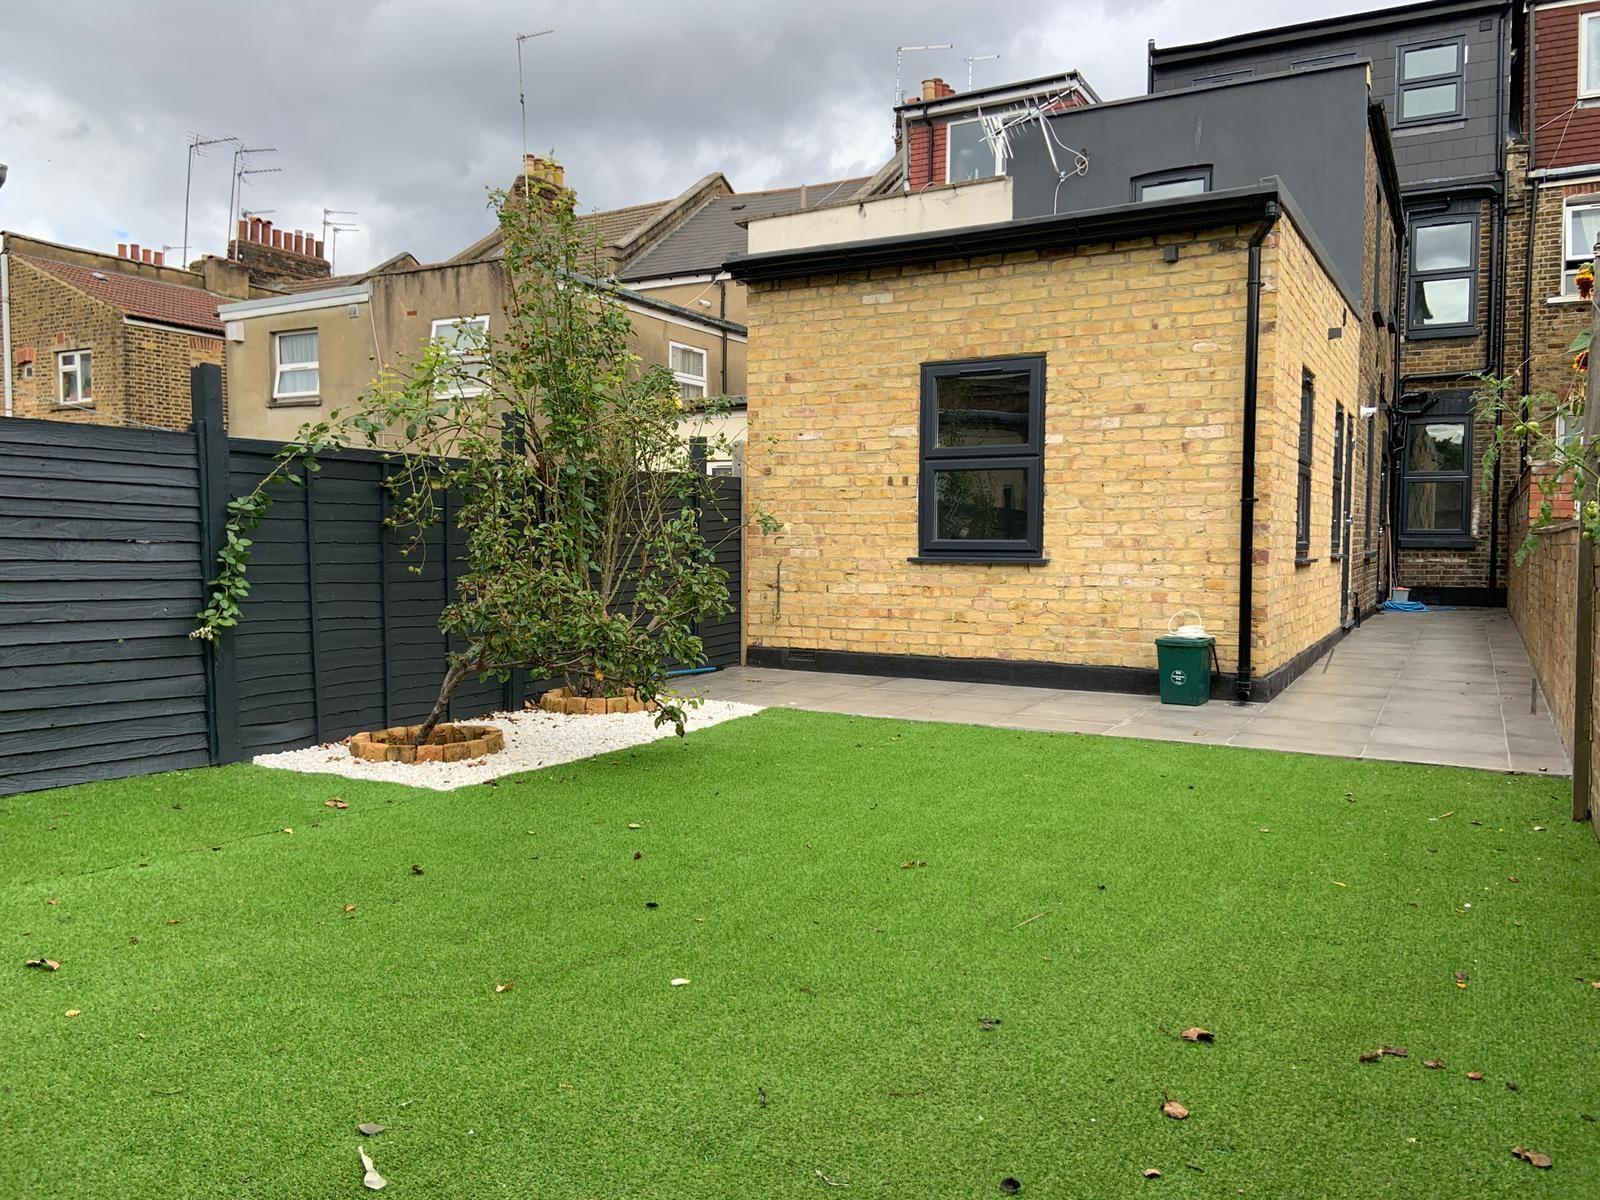 1 bedroom shared house To Let in Willesden Green - Communal garden